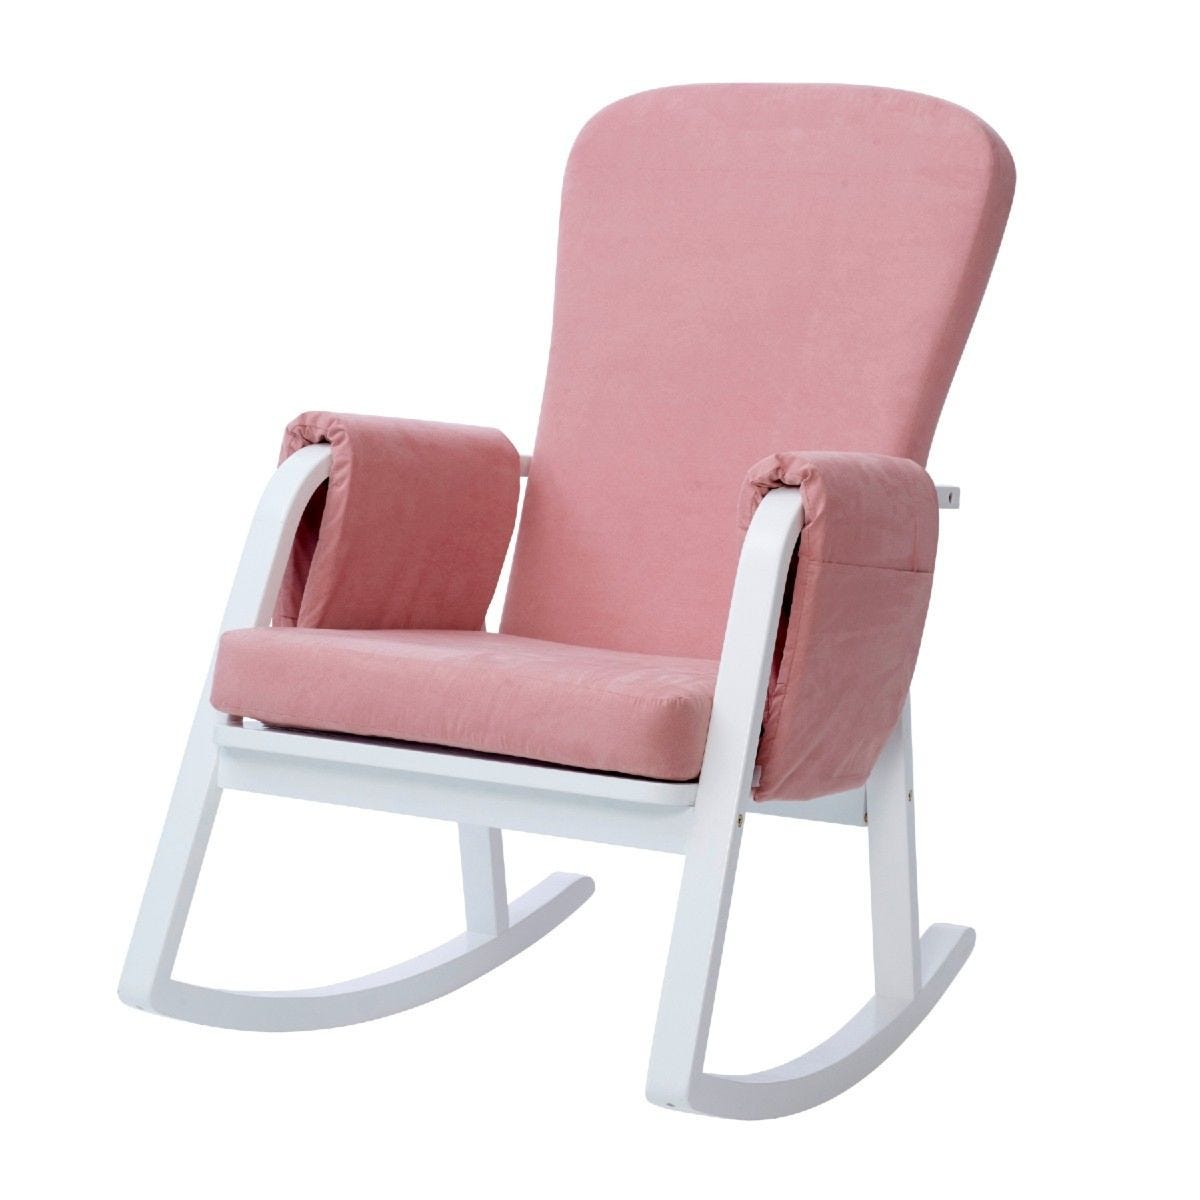 Ickle Bubba Dursley Rocking Chair Blush Pink